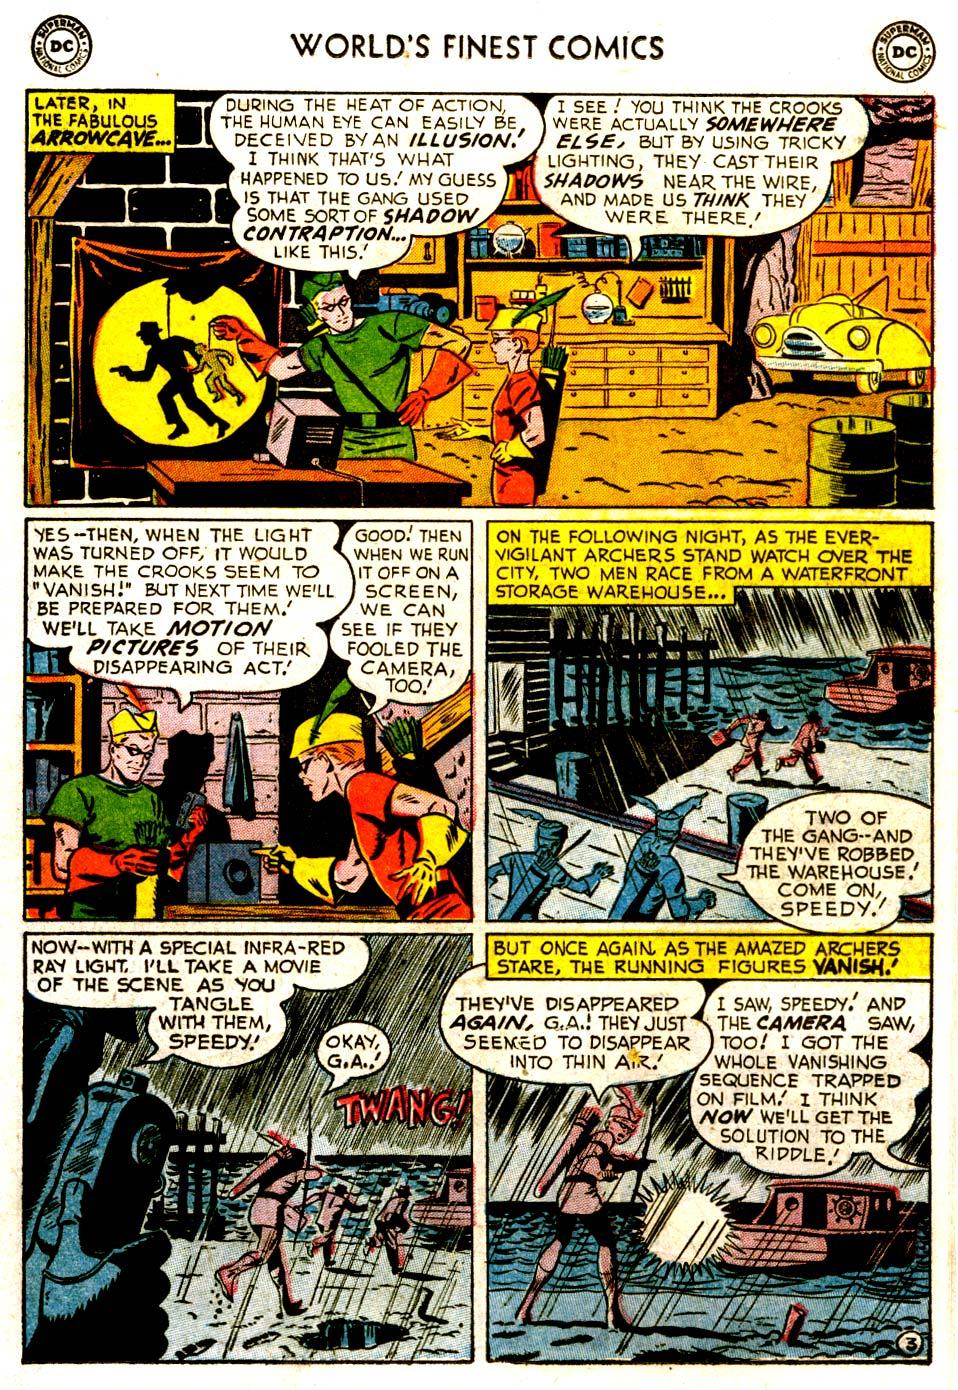 Read online World's Finest Comics comic -  Issue #68 - 29